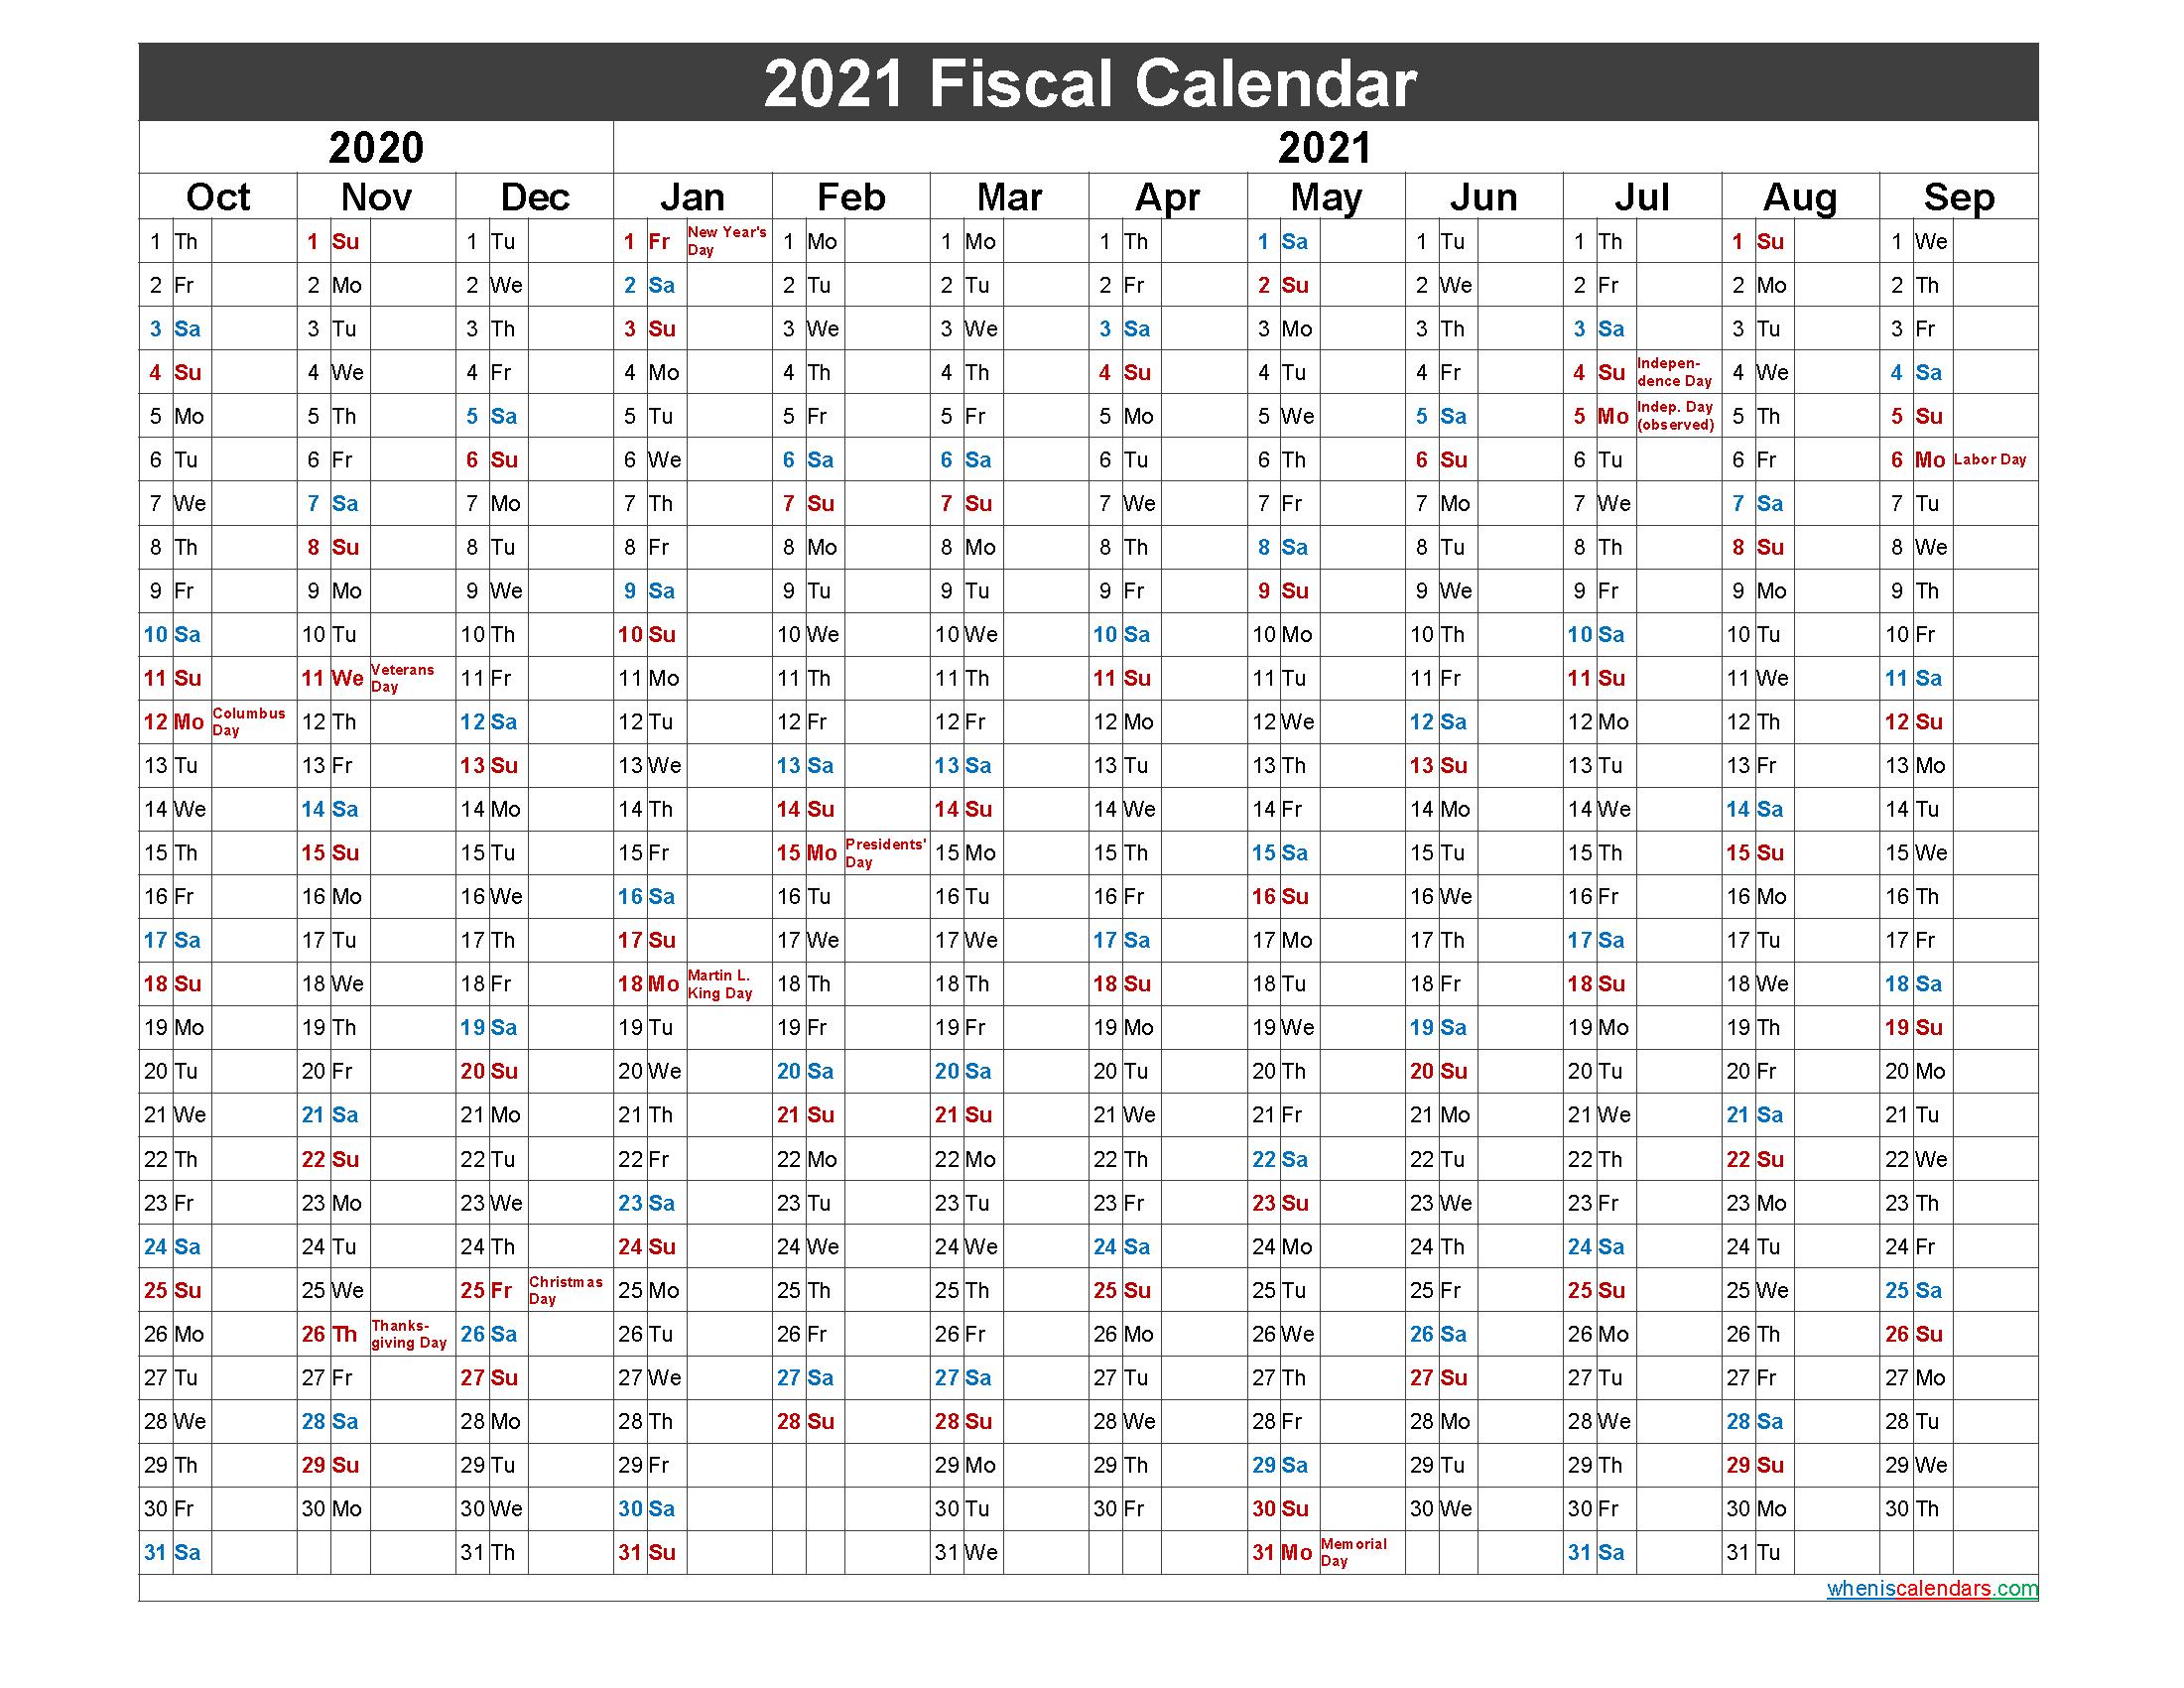 Federal Fiscal Year 2021 Calendar